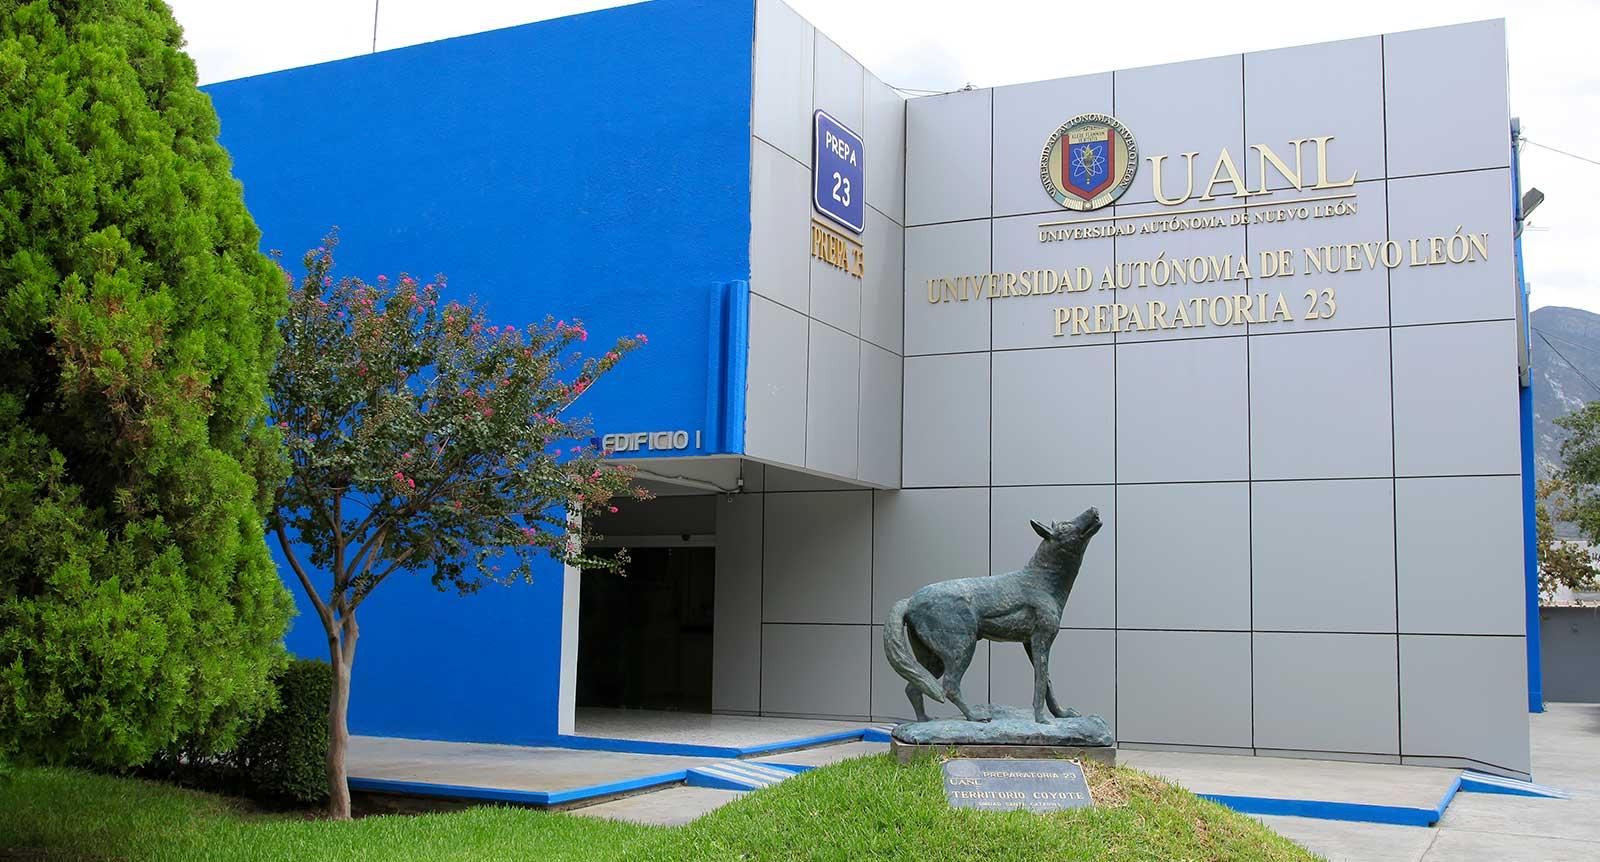 Escuela Preparatoria No. 23 Santa Catarina